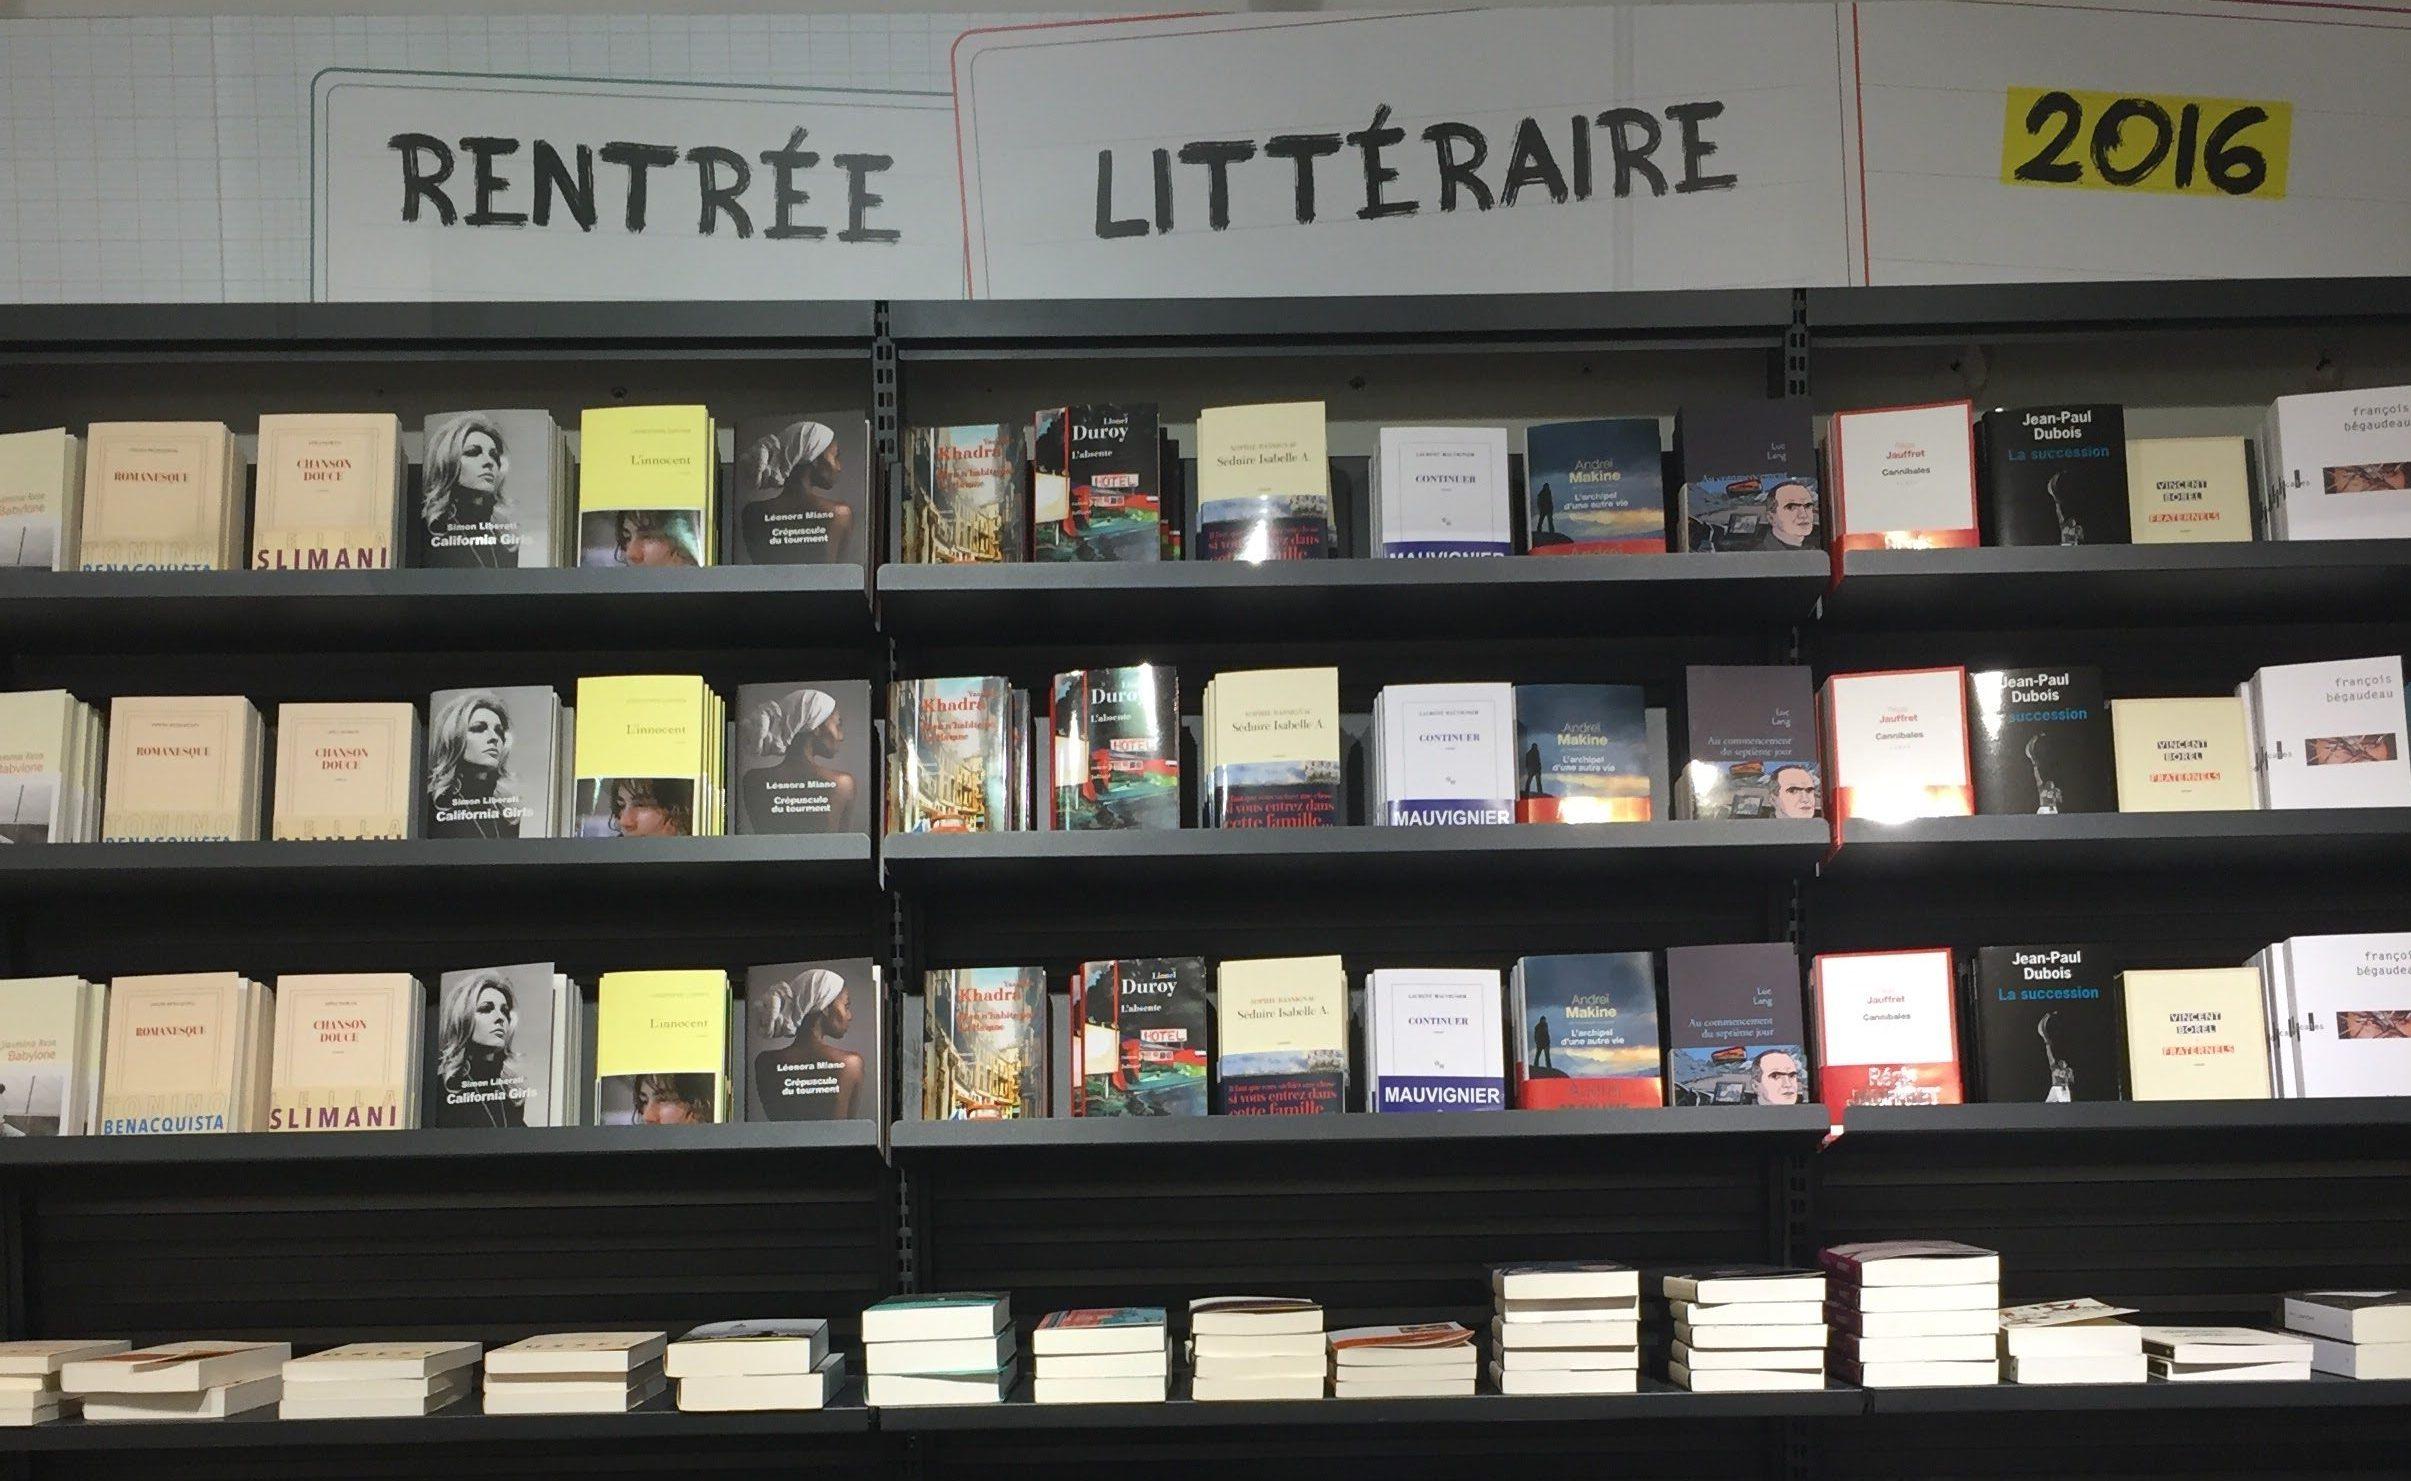 MyFrenchLife™ – myfrenchlife.org – la rentree – litteraire – books